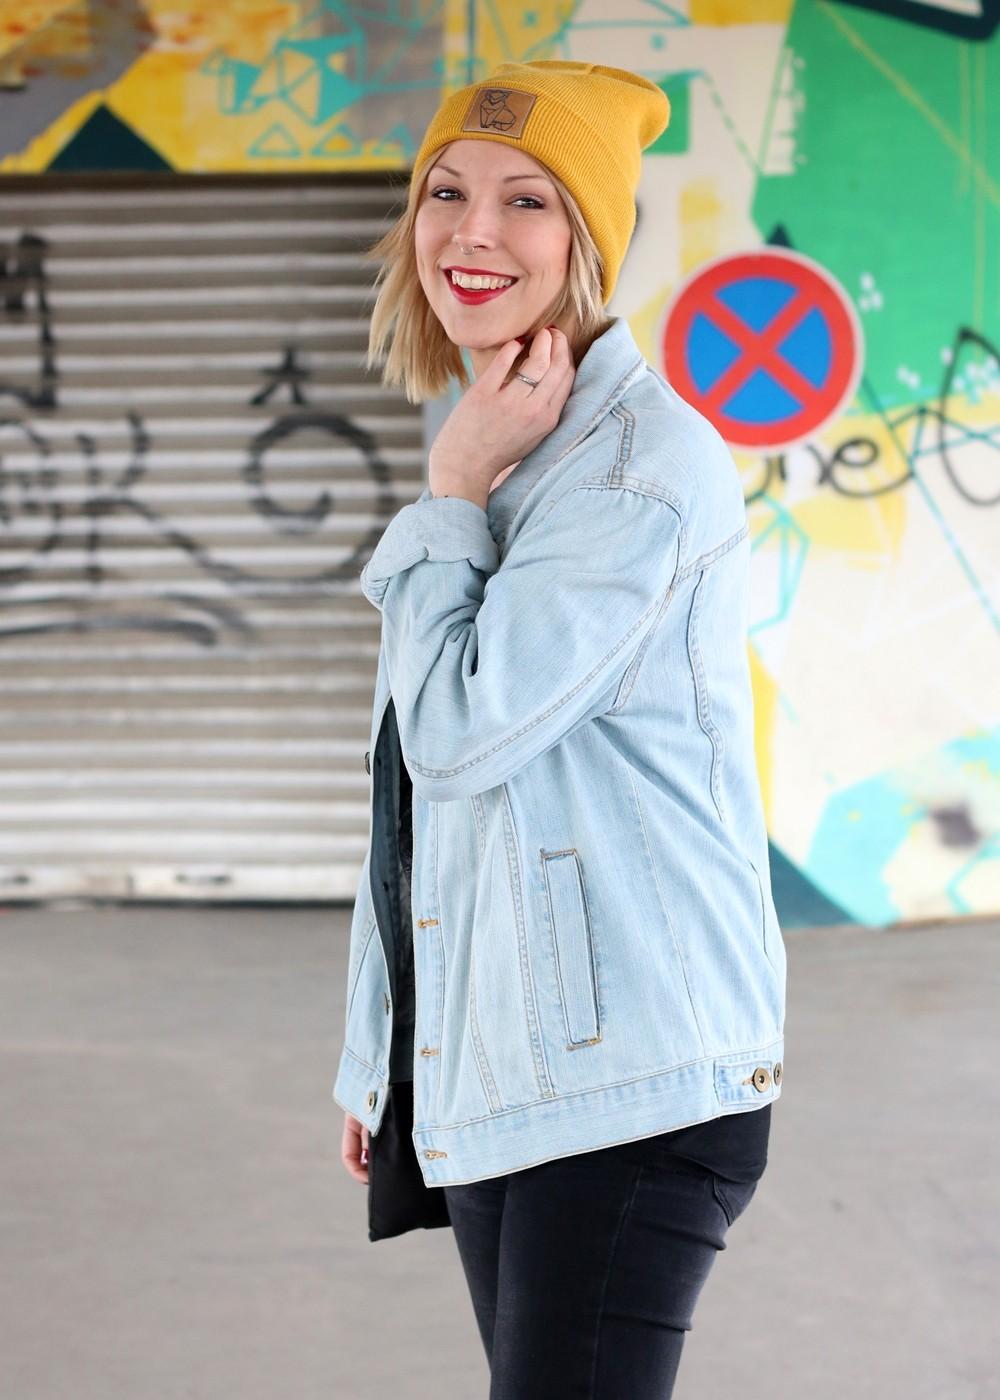 Fahionblogger Outfit Vans Disney Jeansjacke Beanie Fuchs Weebit (5)